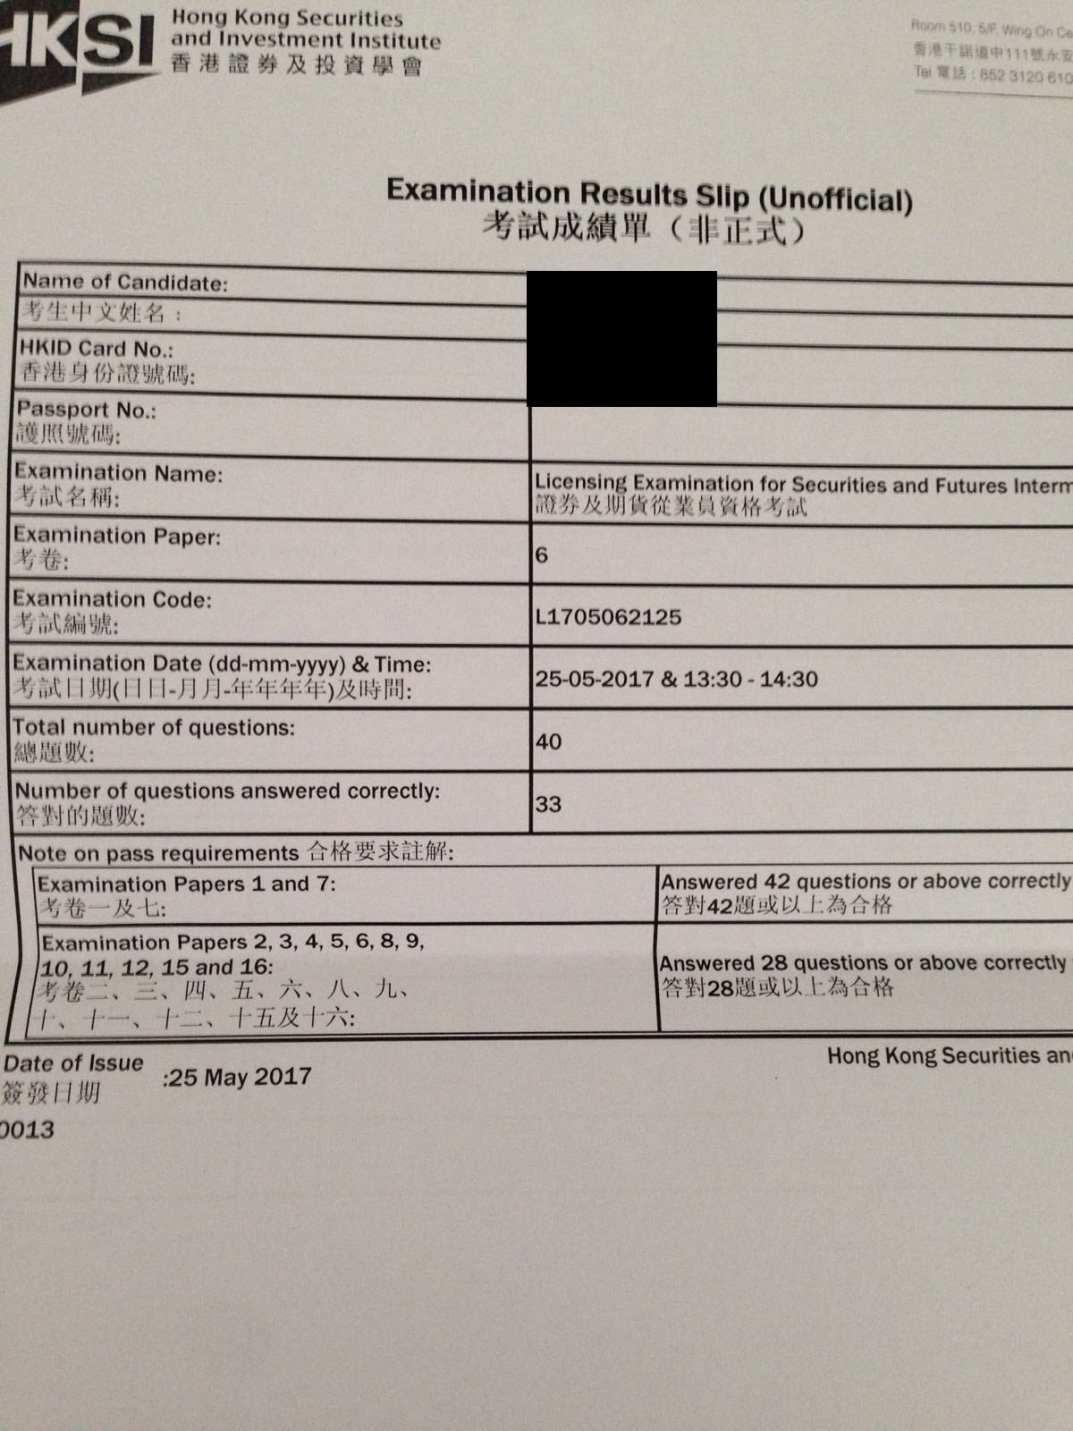 OK 25/5/2017 LE Paper 6 證券期貨從業員資格考試卷六 Pass